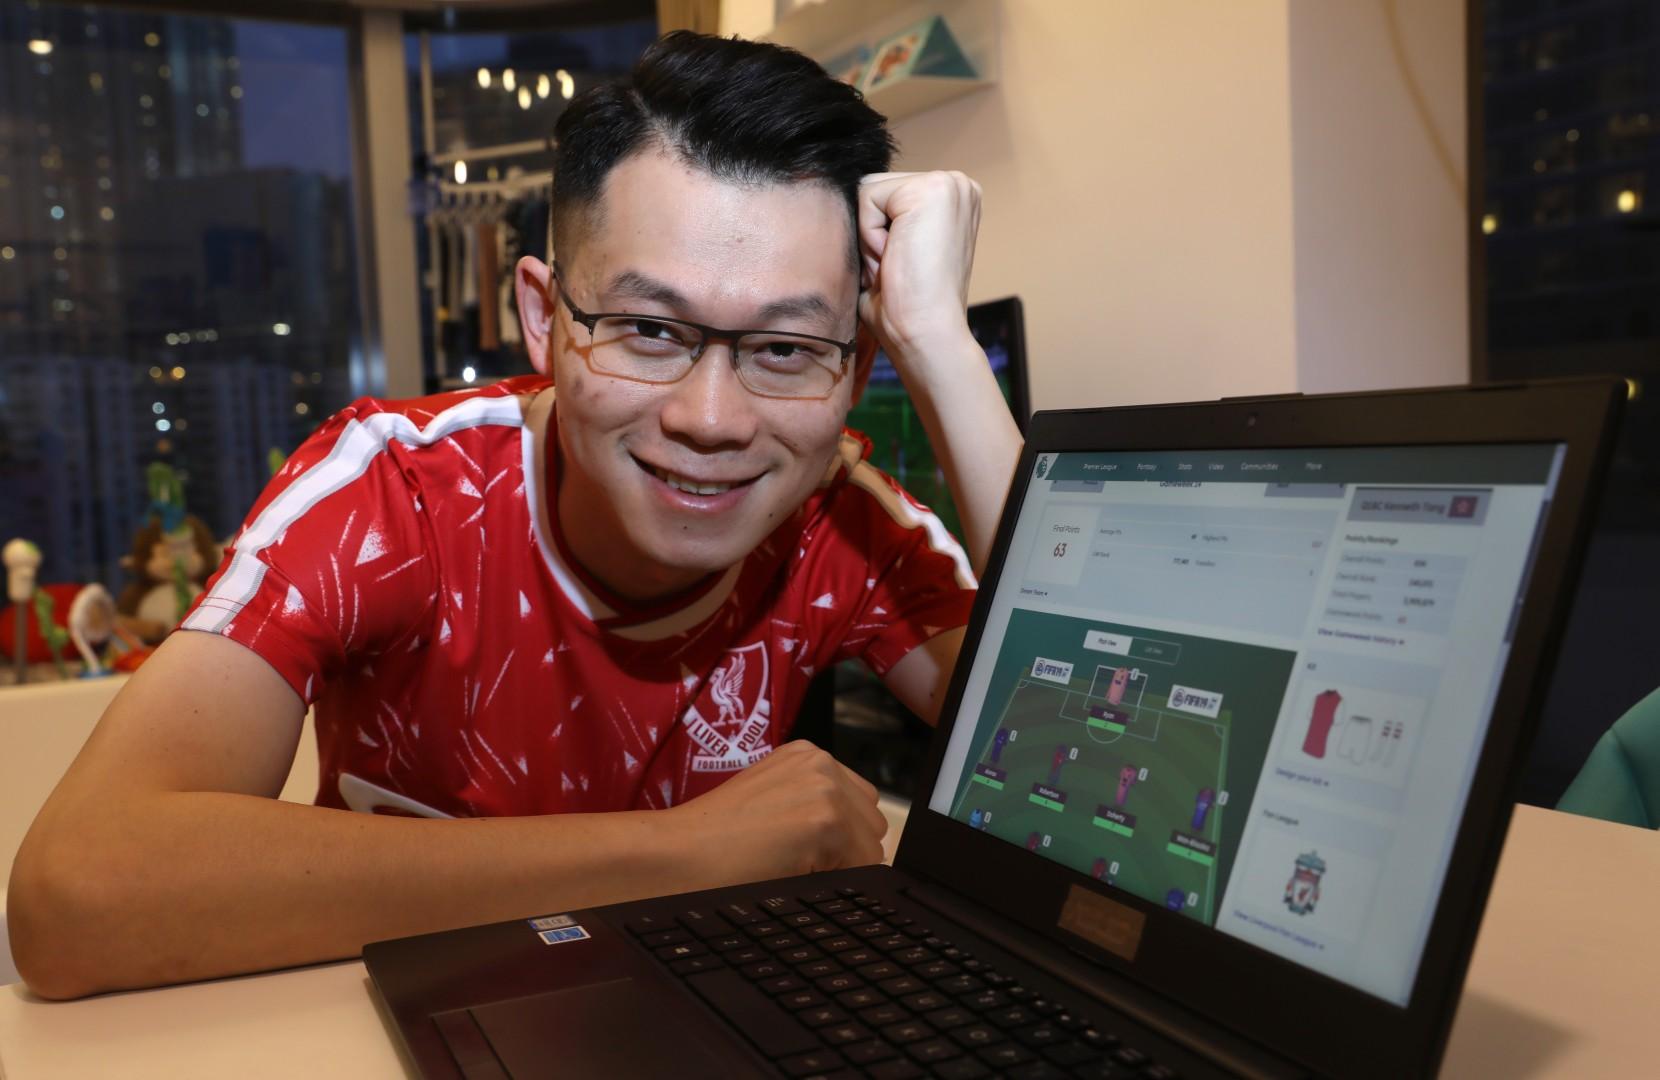 Hong Kong Fantasy Premier League manager among world's best